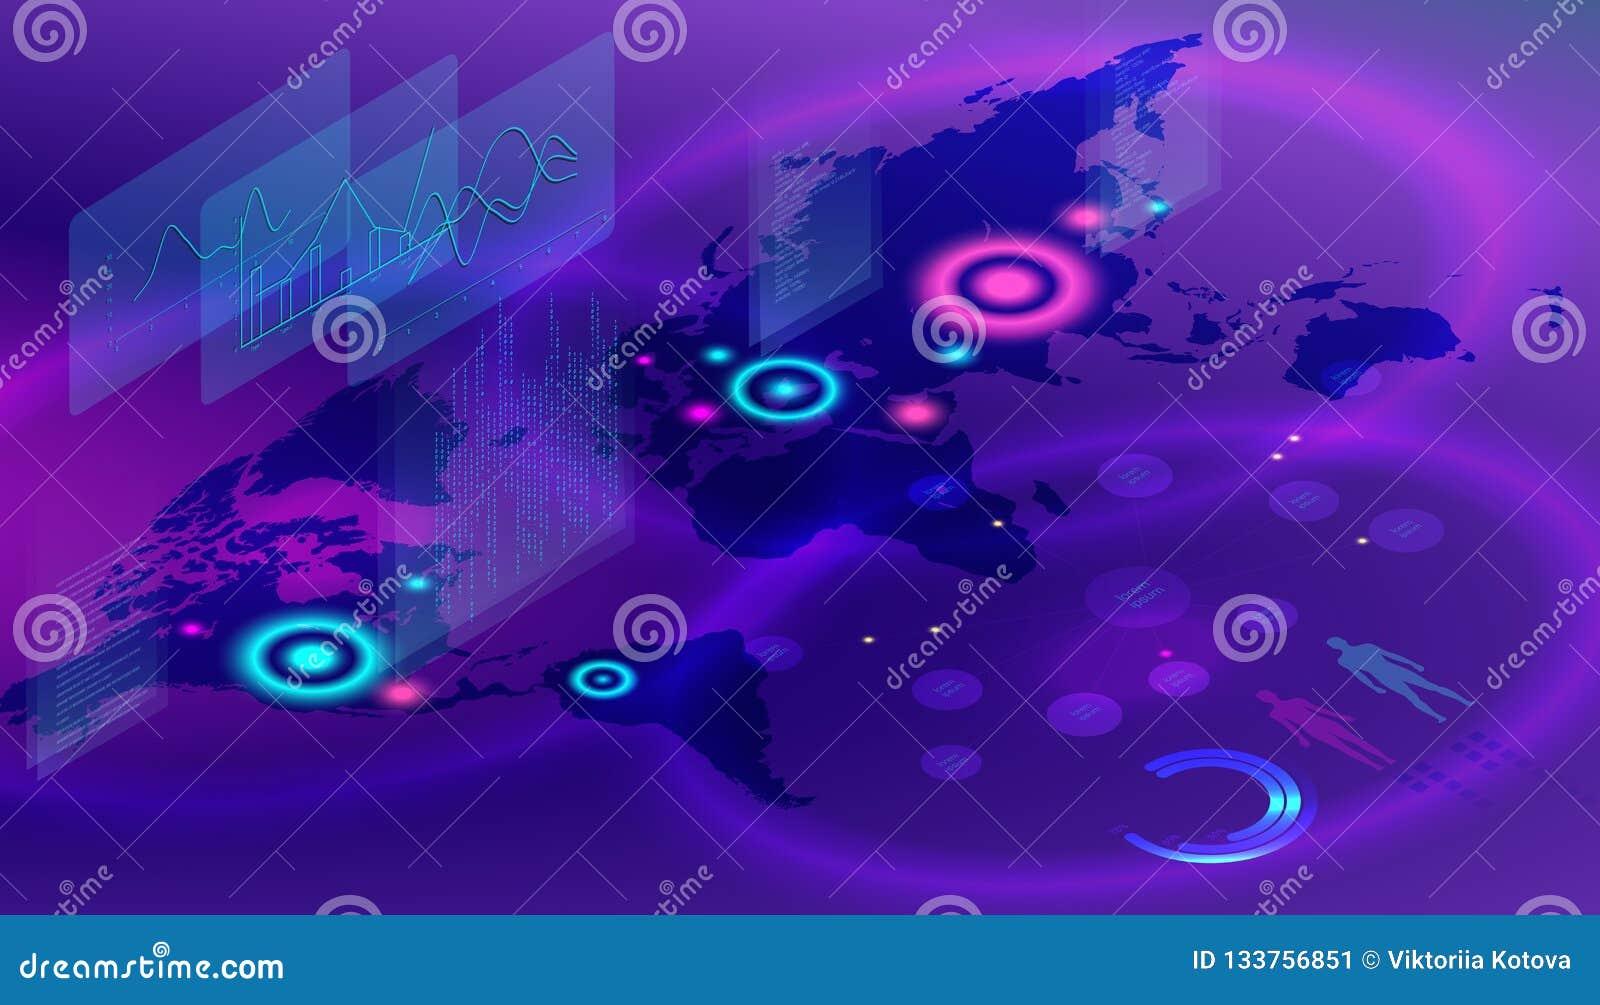 Isometric ψηφιακός παγκόσμιος χάρτης Έννοια πέρα από τον πληθυσμό διανυσματική απεικόνιση του σφαιρικού χάρτη στο isometric ύφος